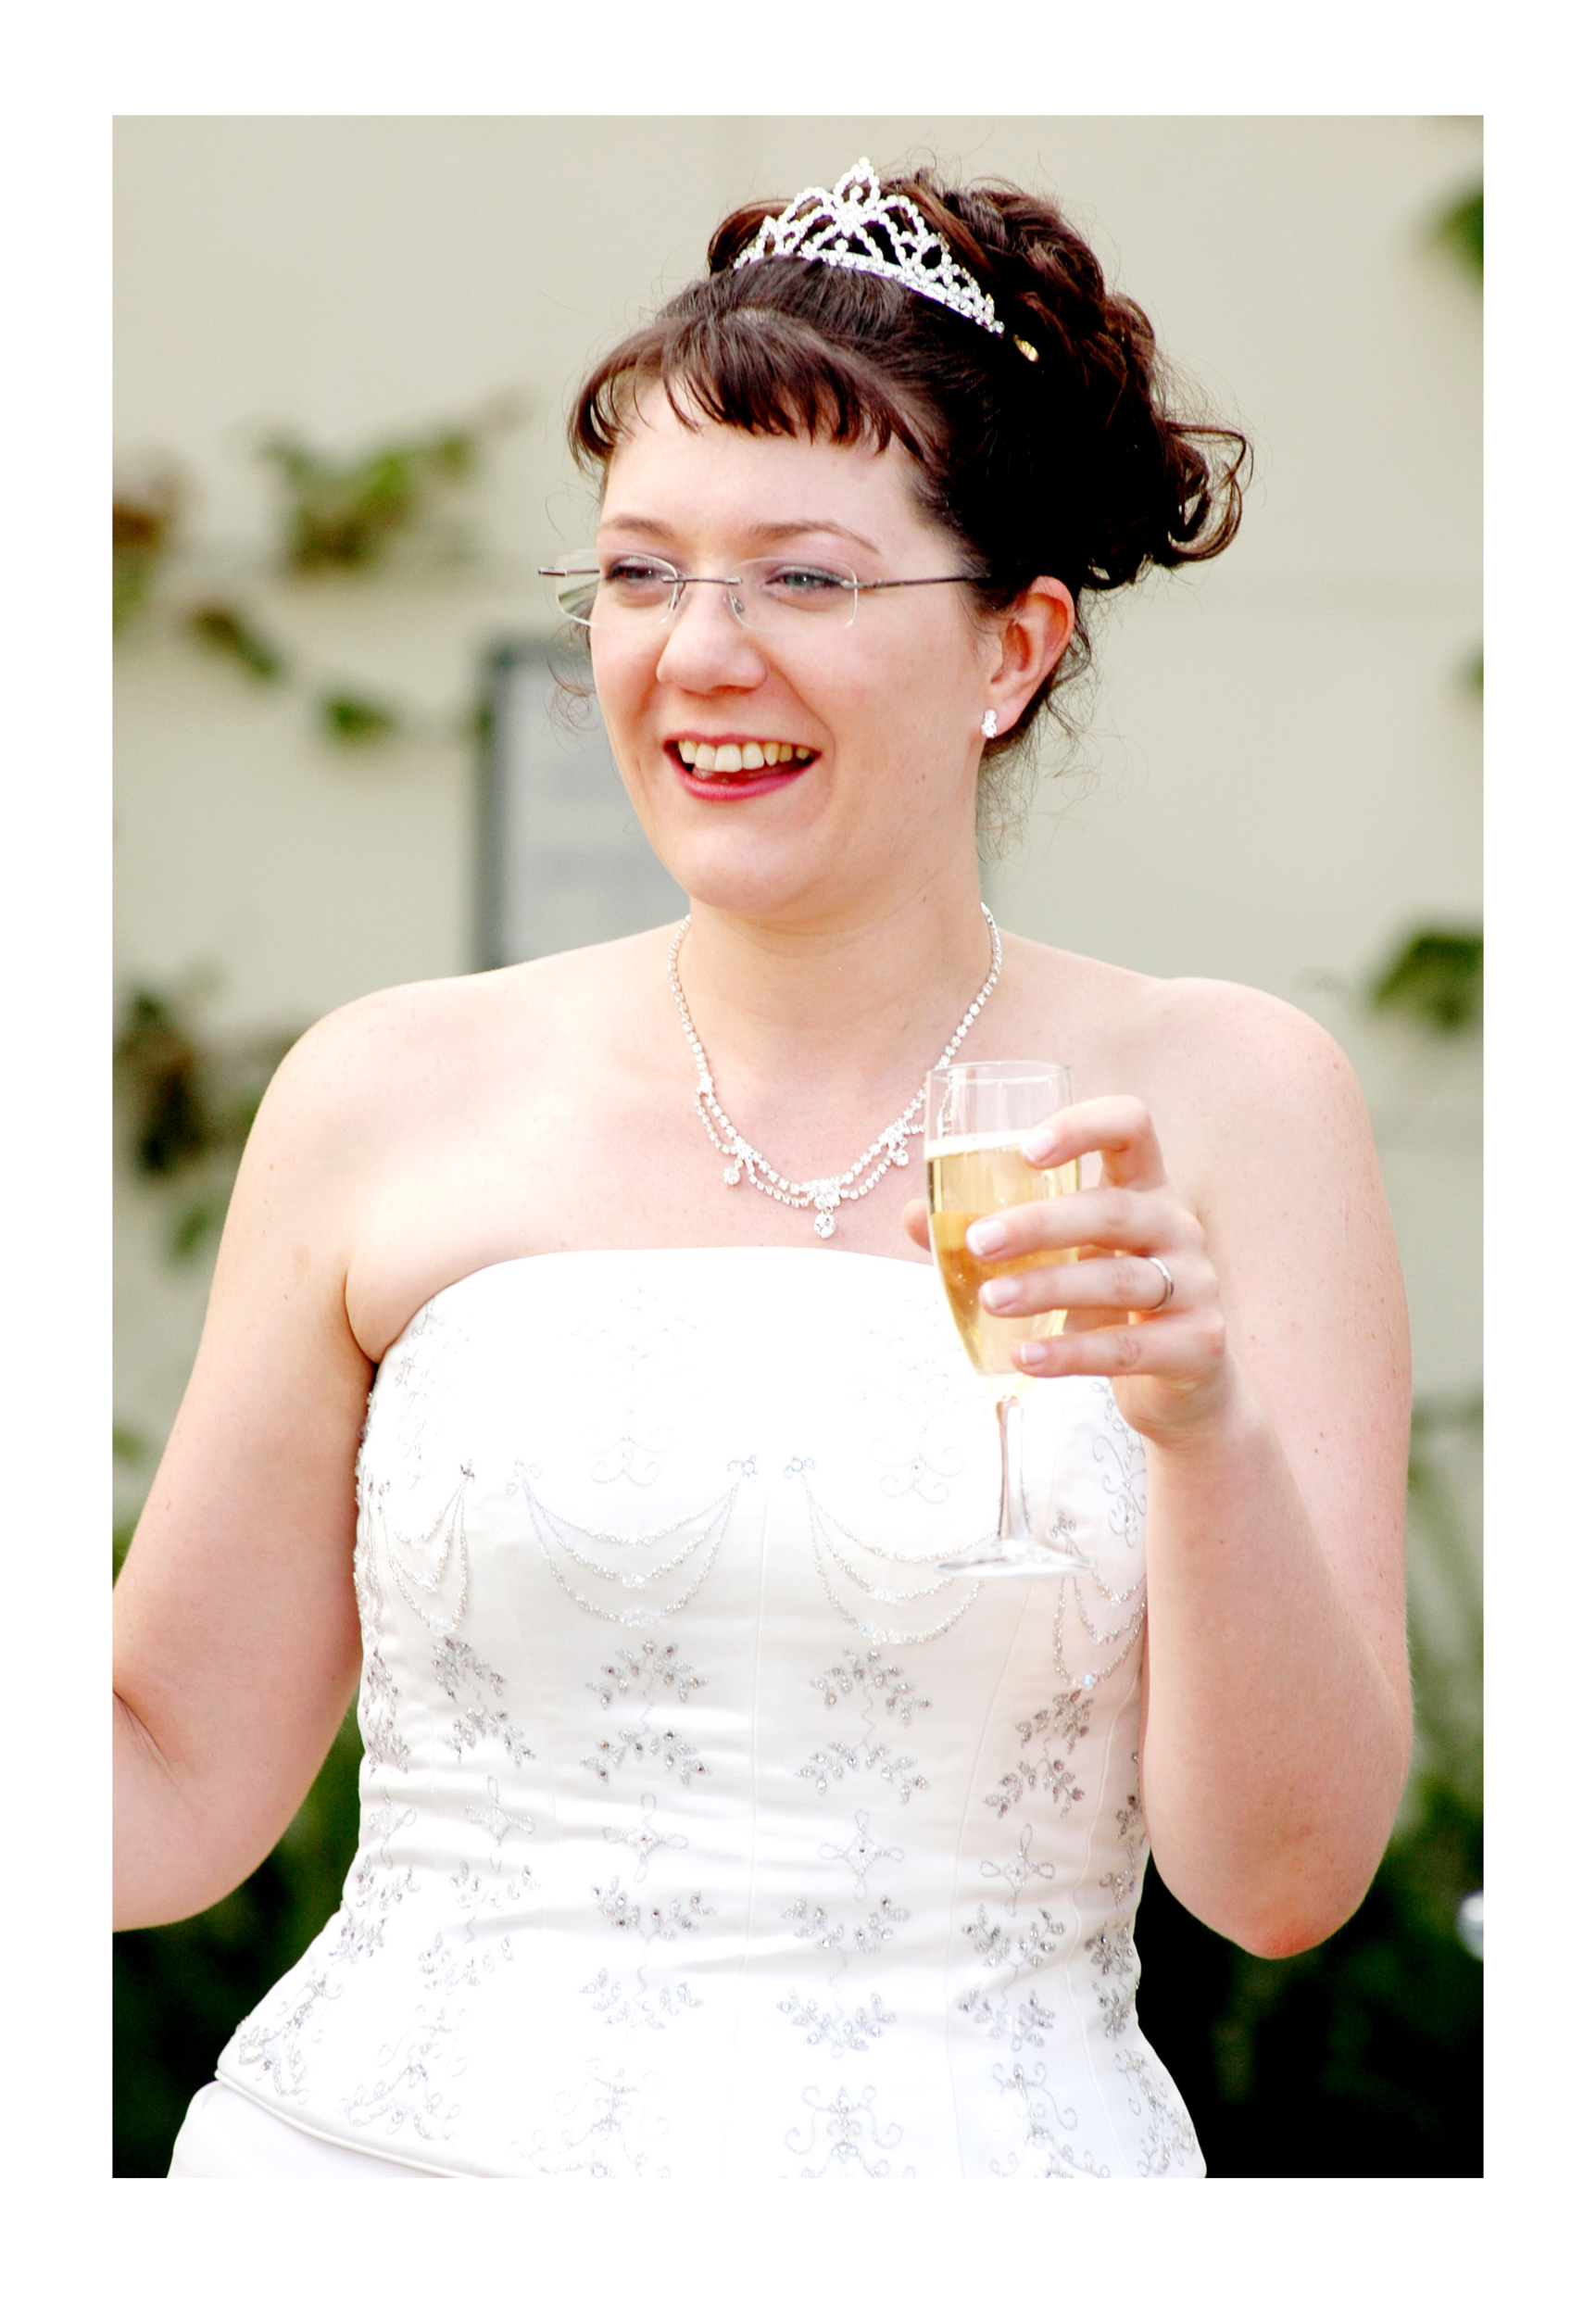 REPORTAGE-WEDDING-PHOTOGRAPHY-SET-UK-26.jpg